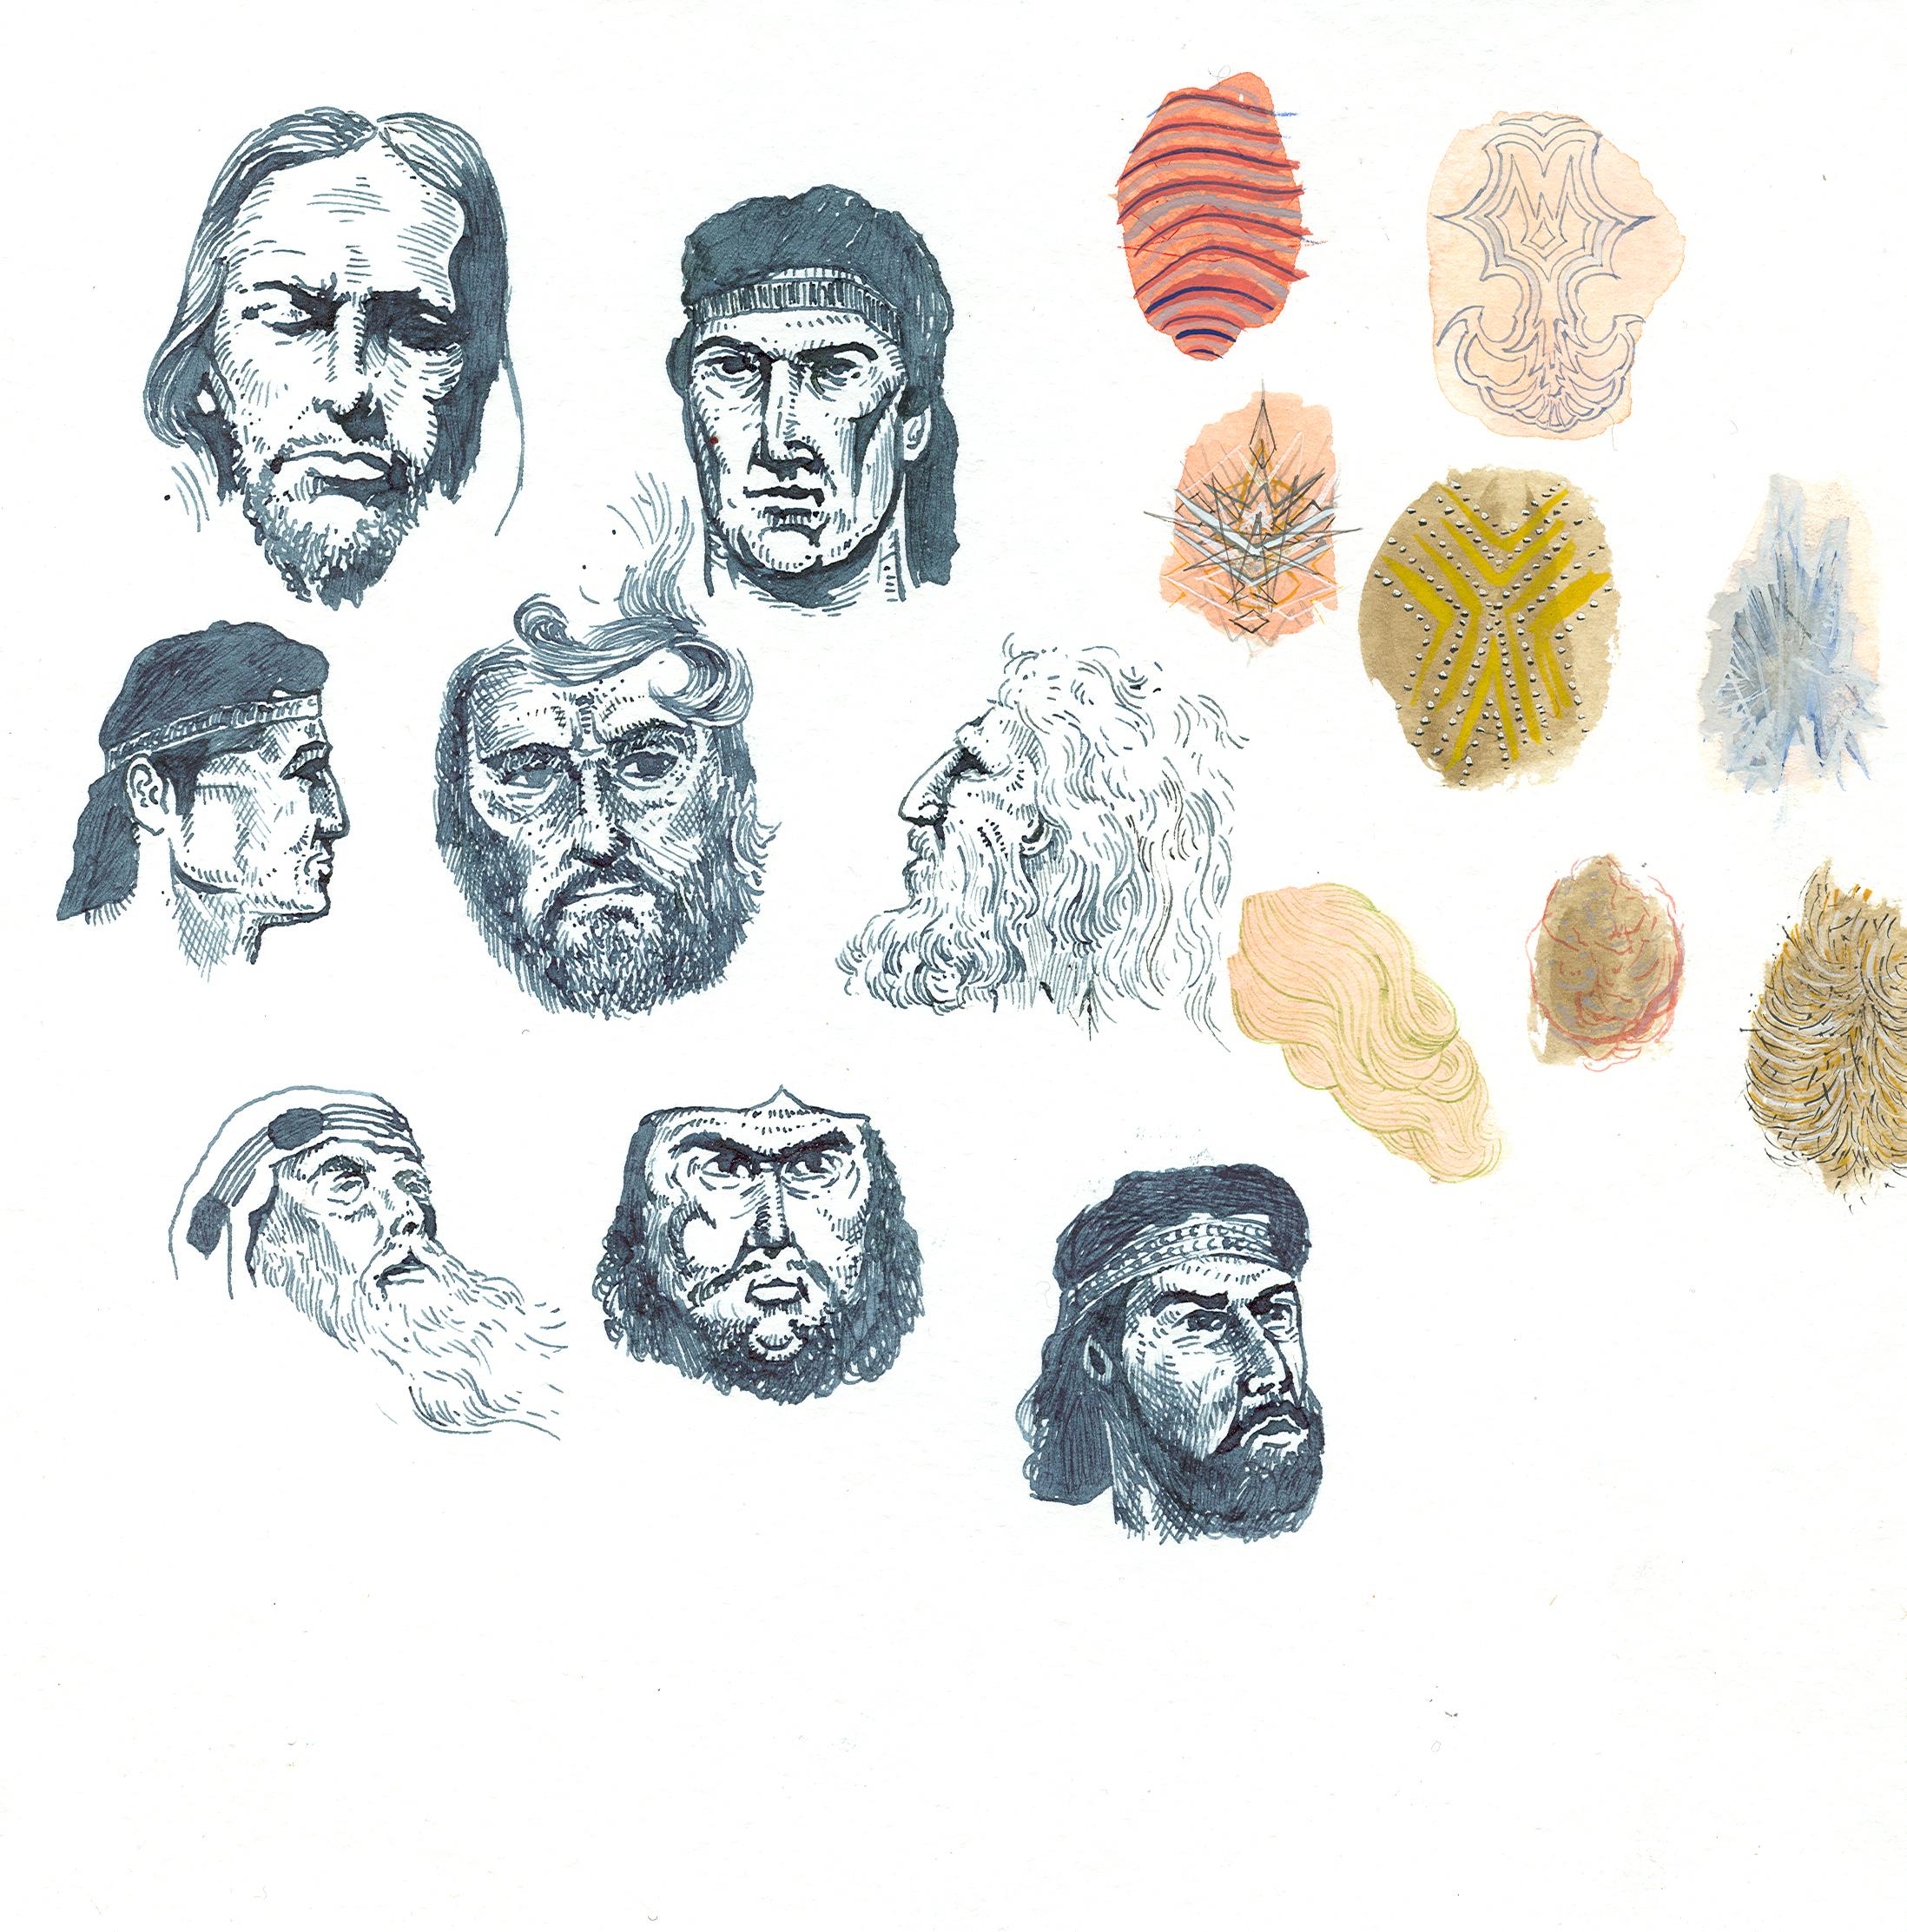 8 Book of Mormon Faces and Their Corresponding Black Matter